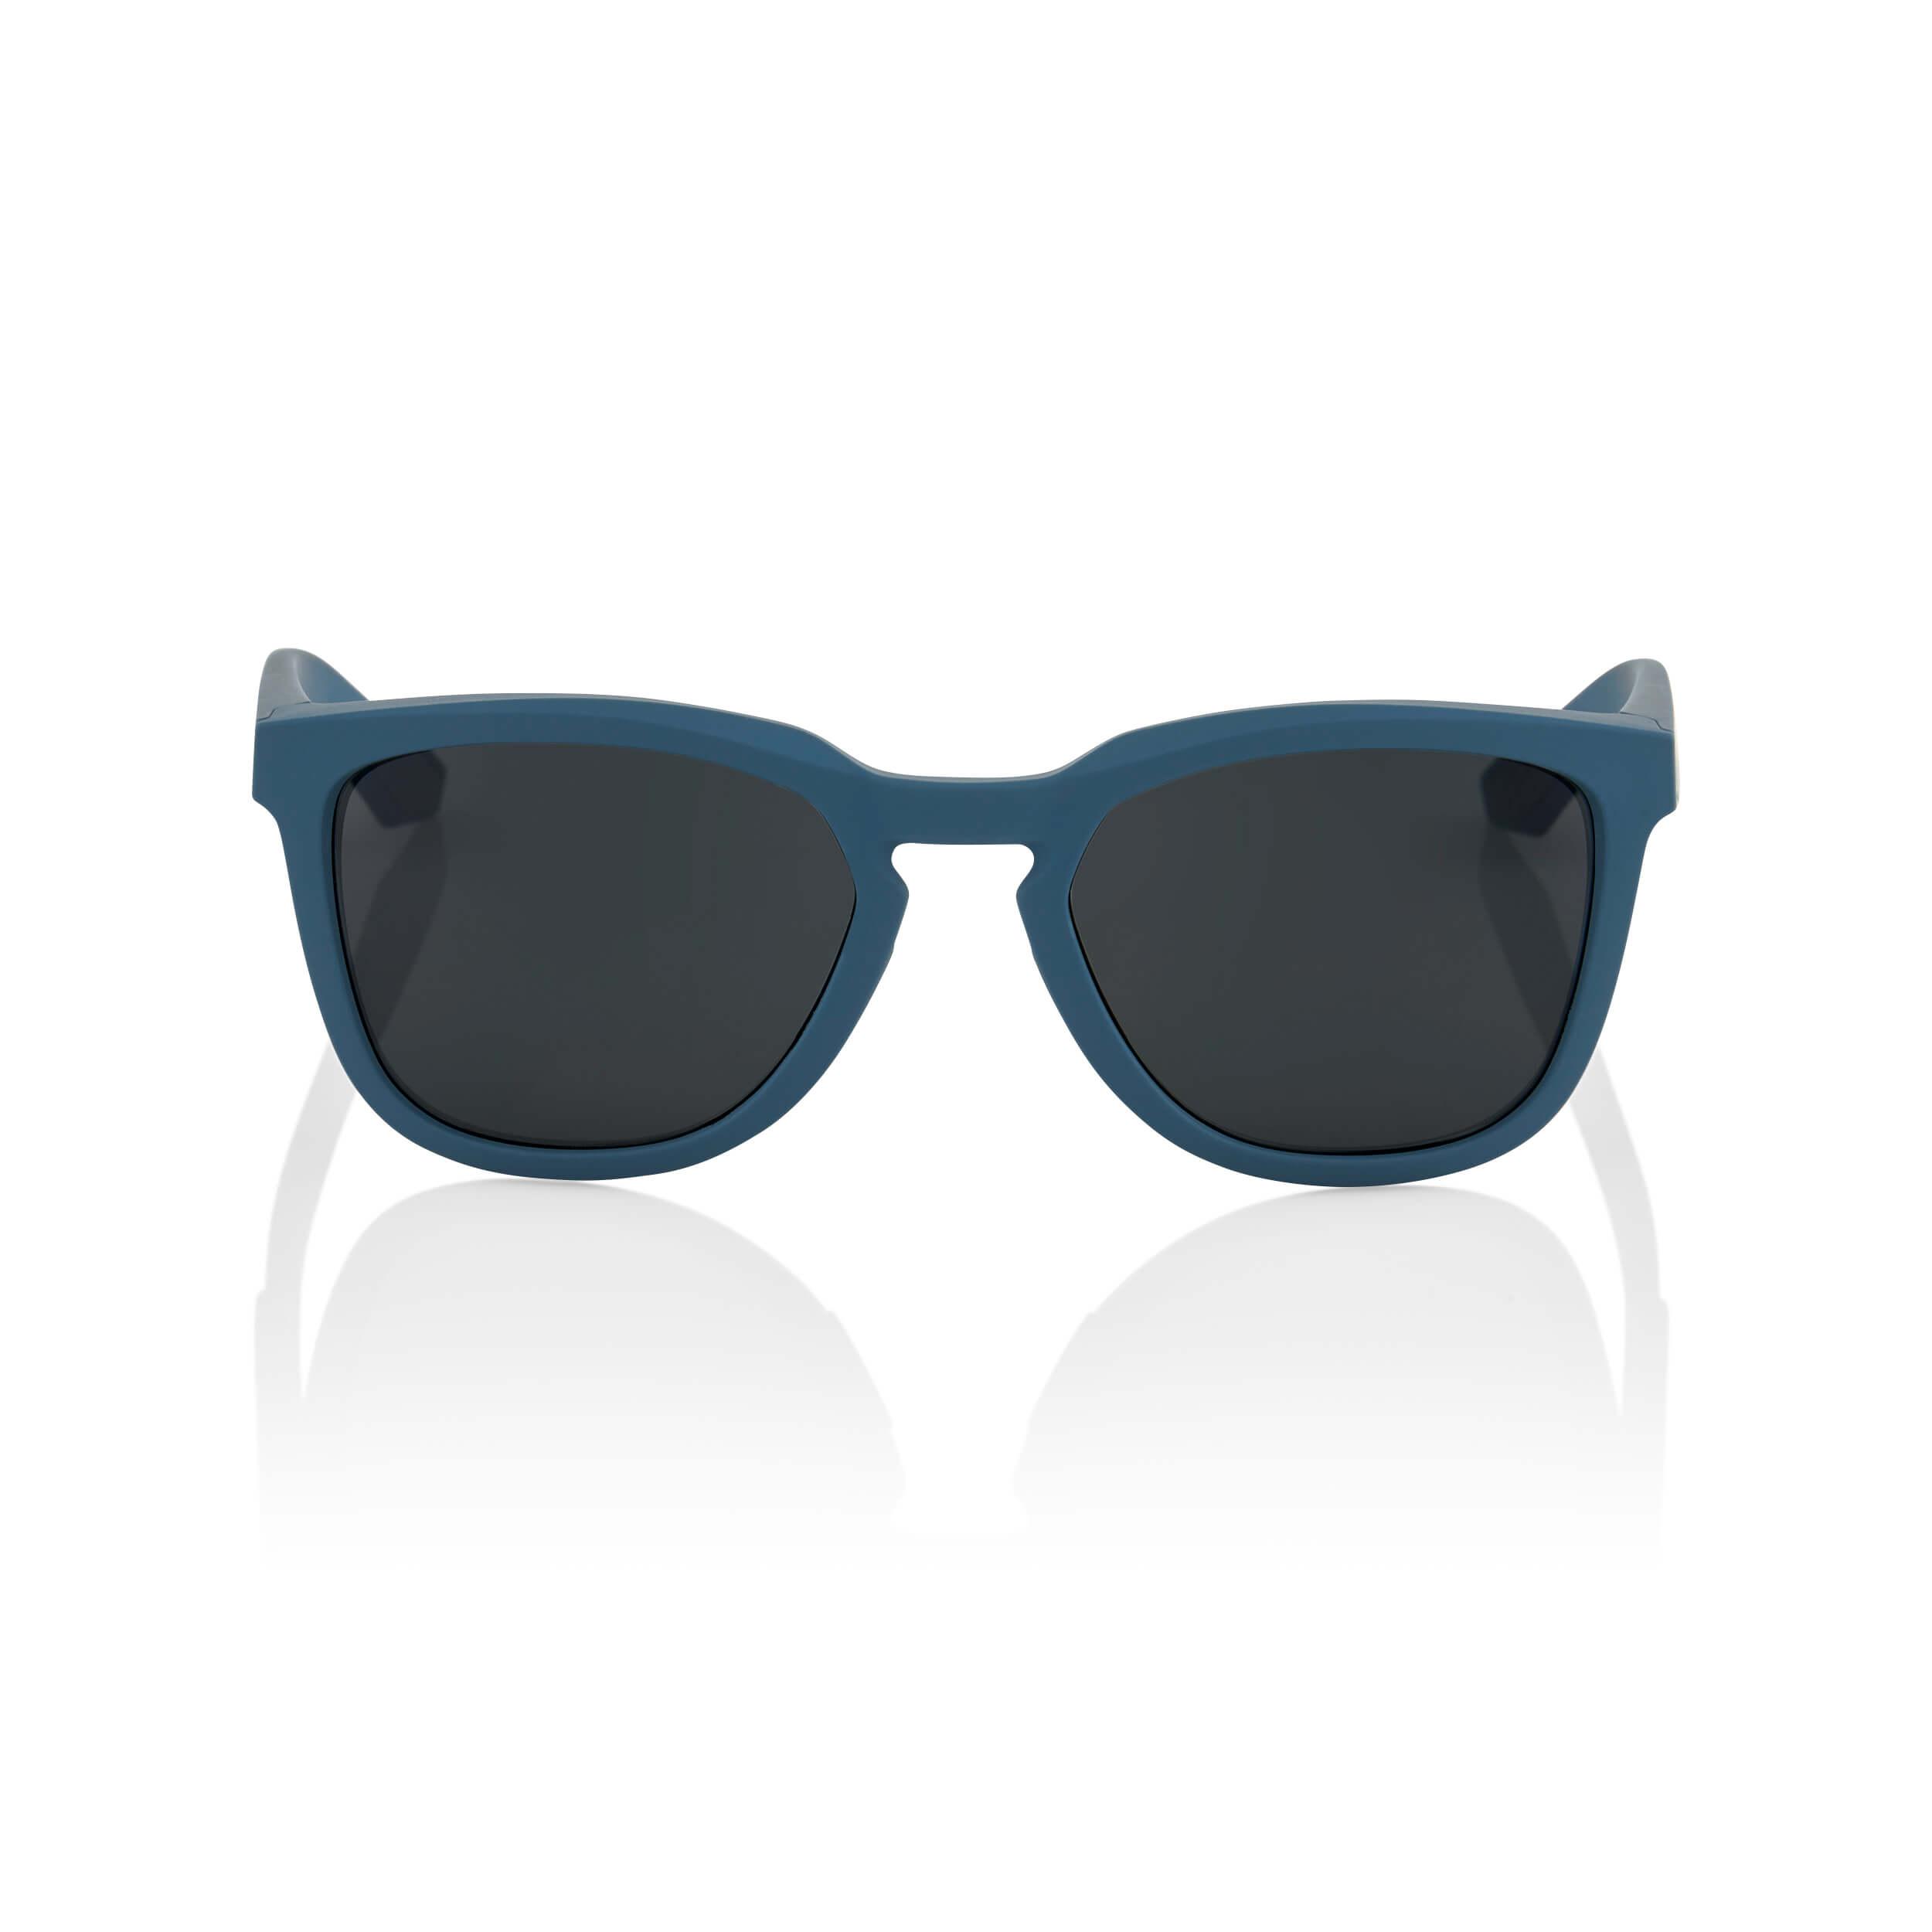 HUDSON – Soft Tact Blue – Smoke Lens